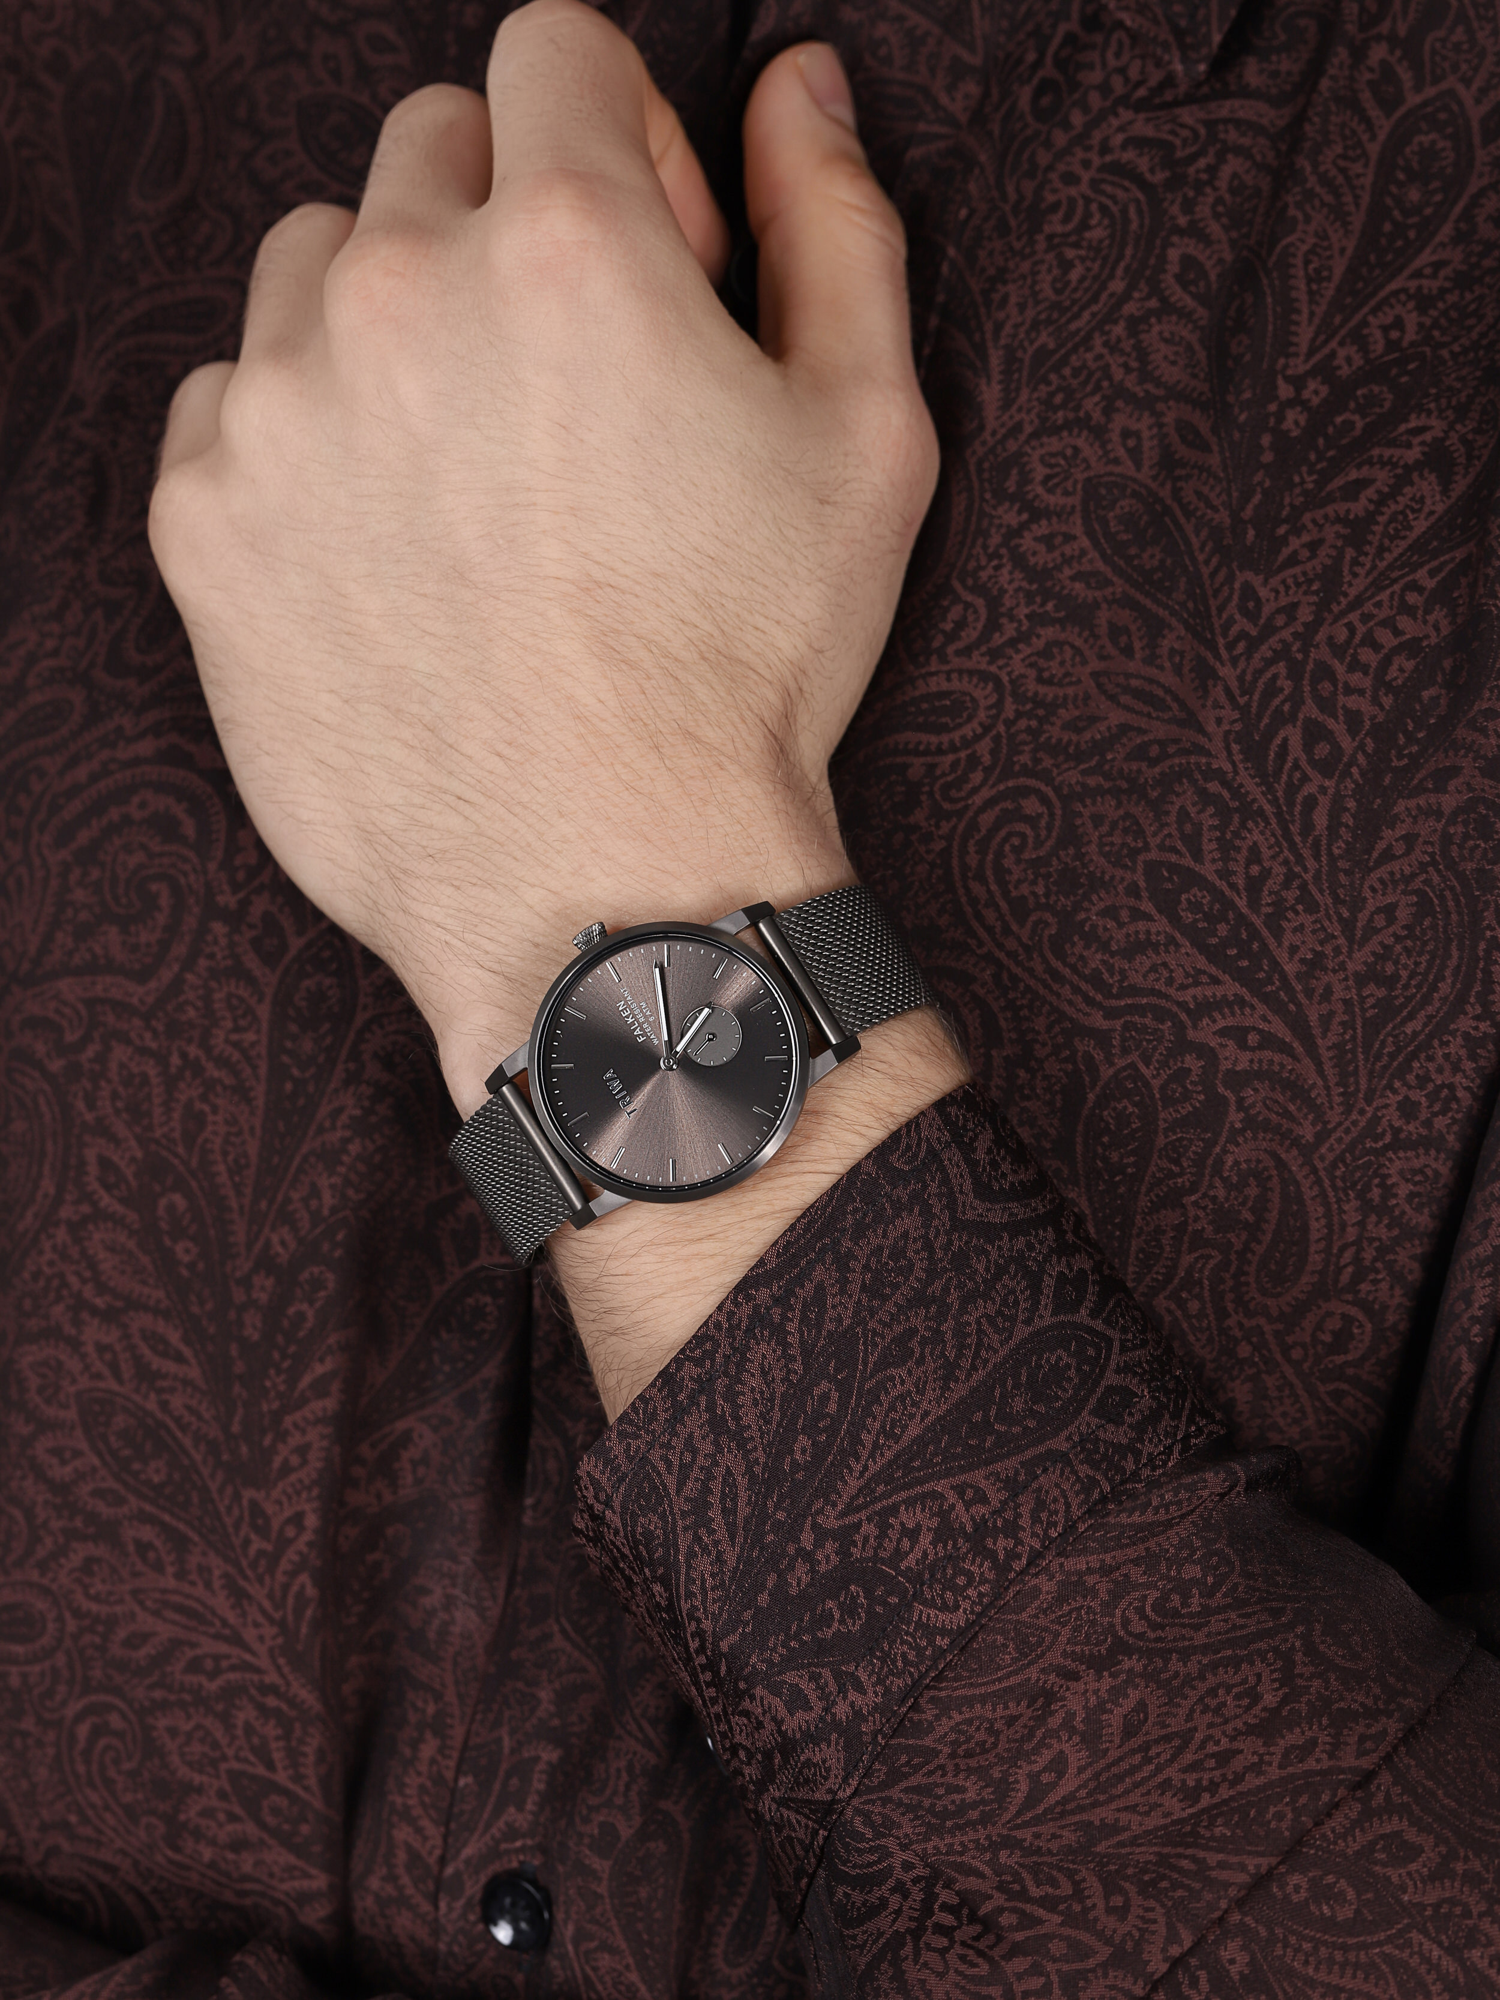 Triwa FAST125-ME023412 Falken BRONZE FALKEN GUN MESH zegarek męski klasyczny mineralne